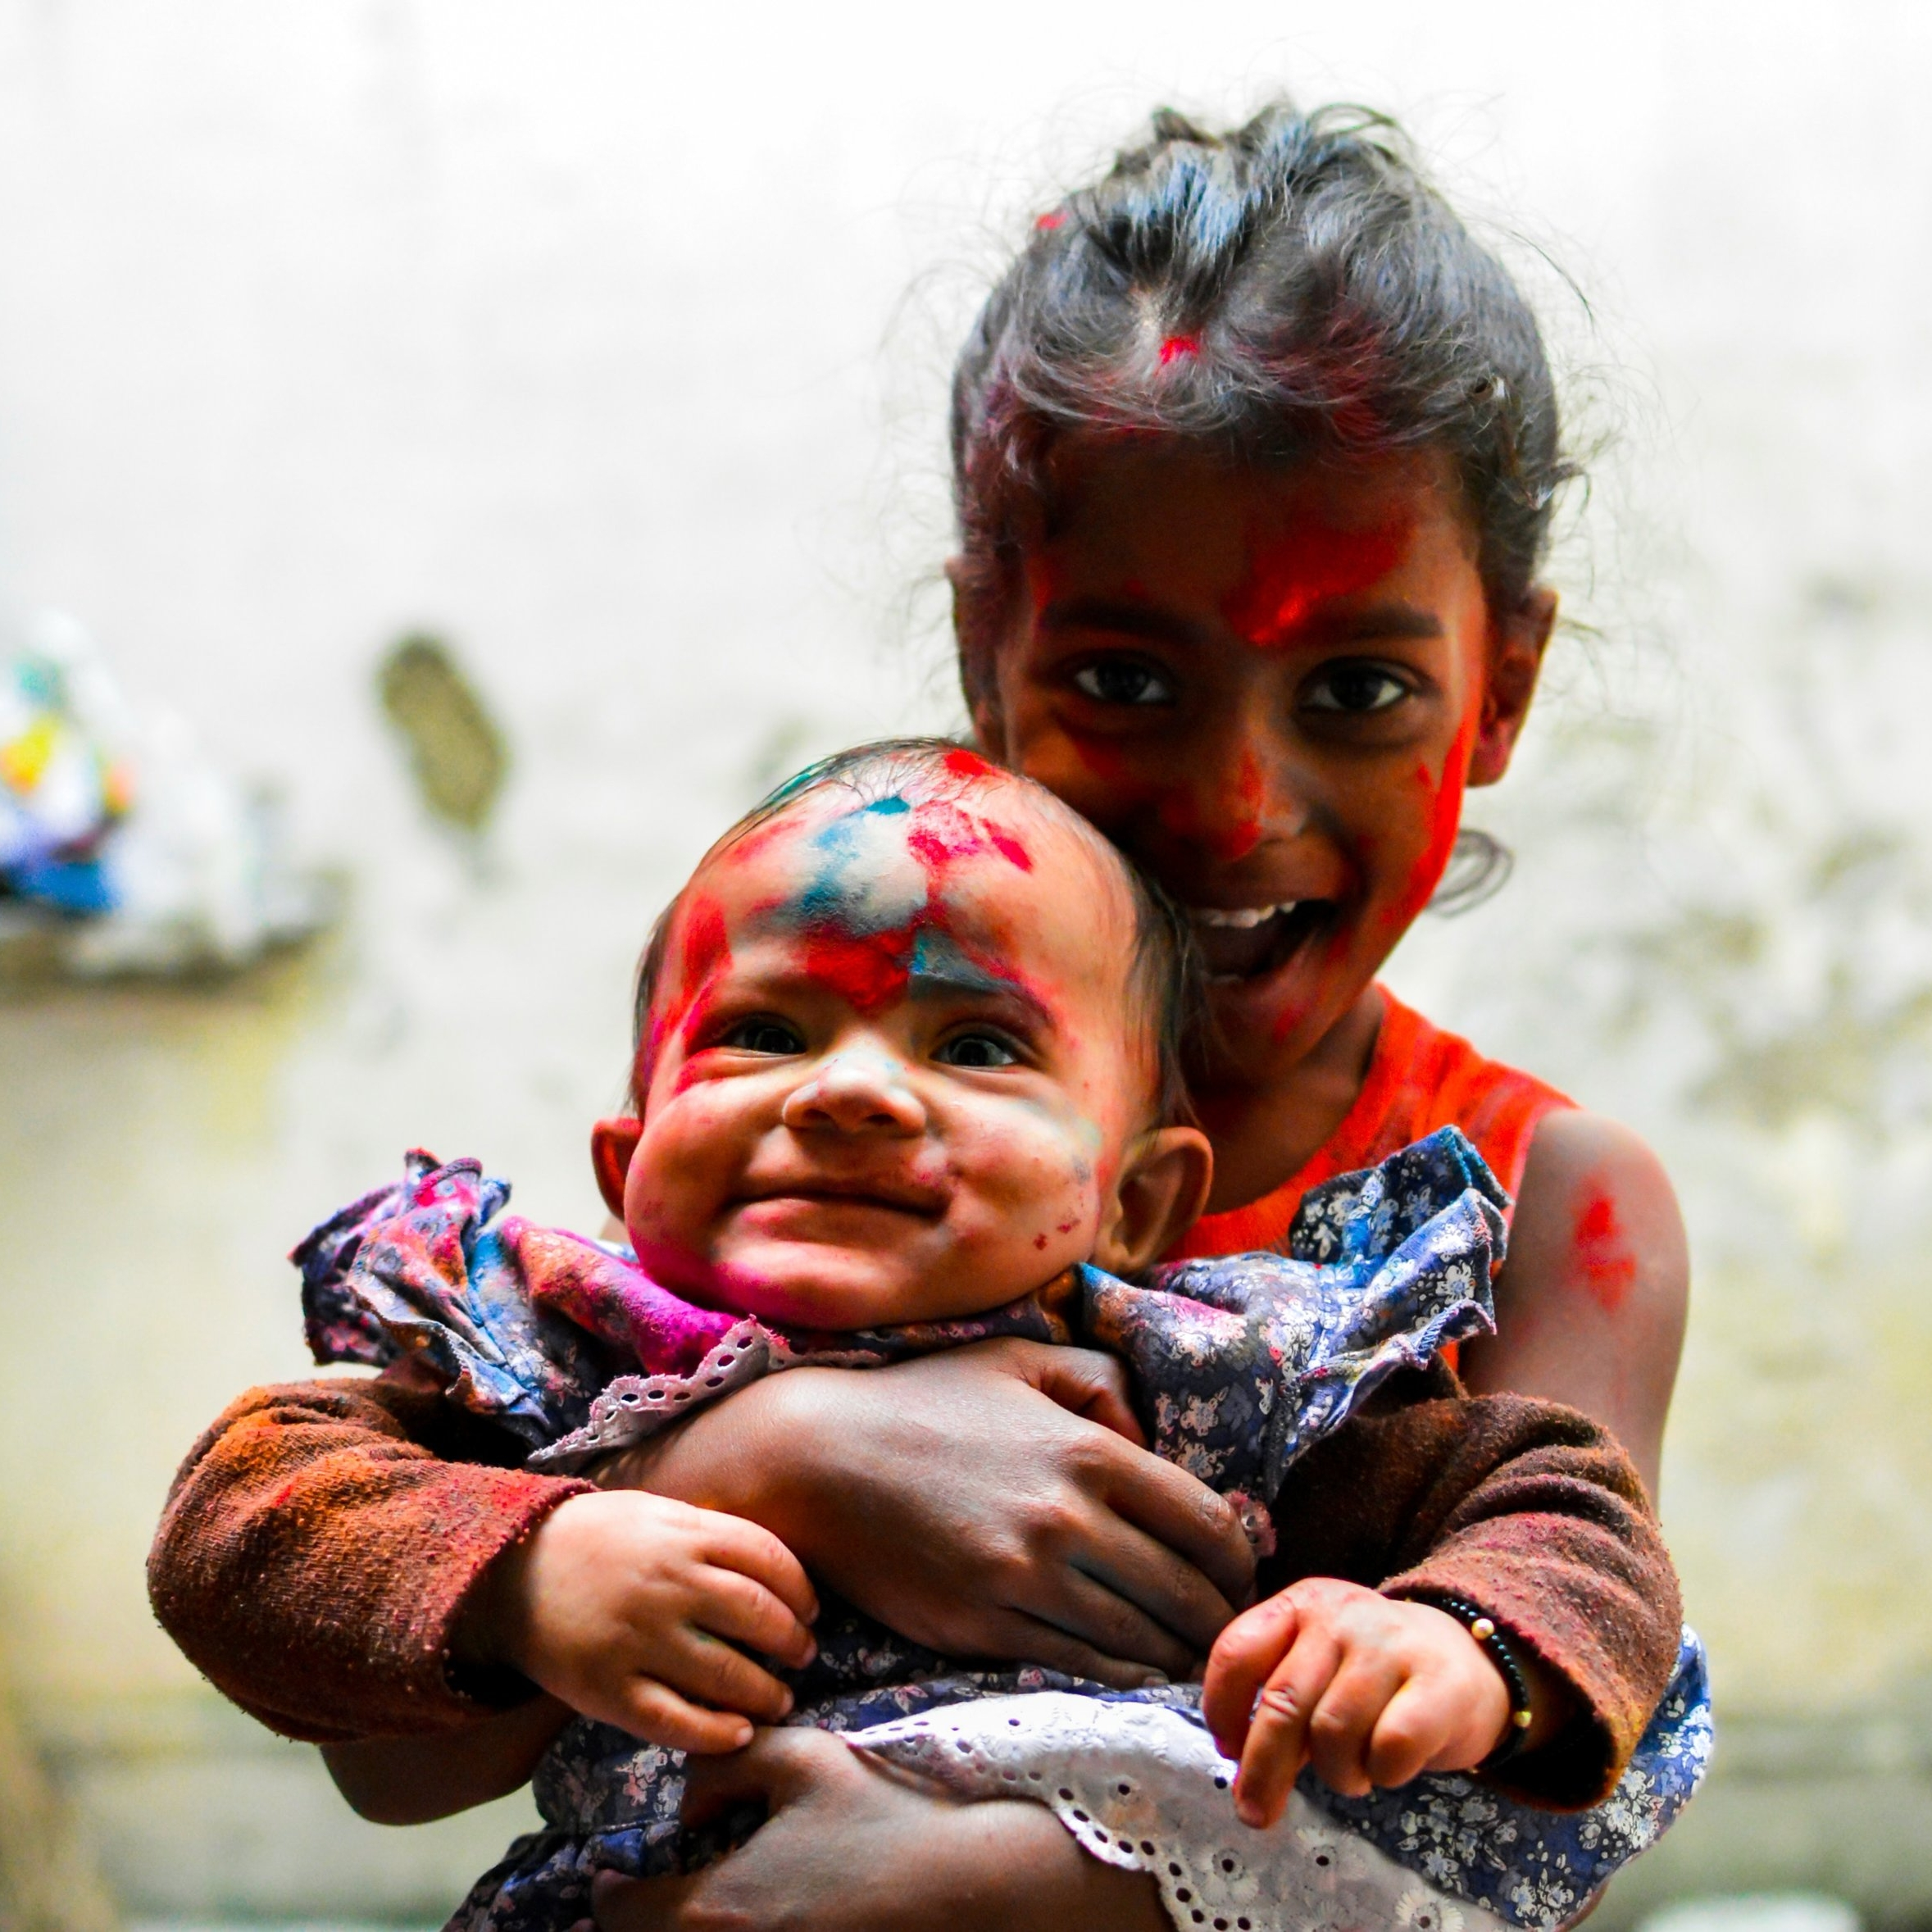 Girl & Baby Paint.jpg